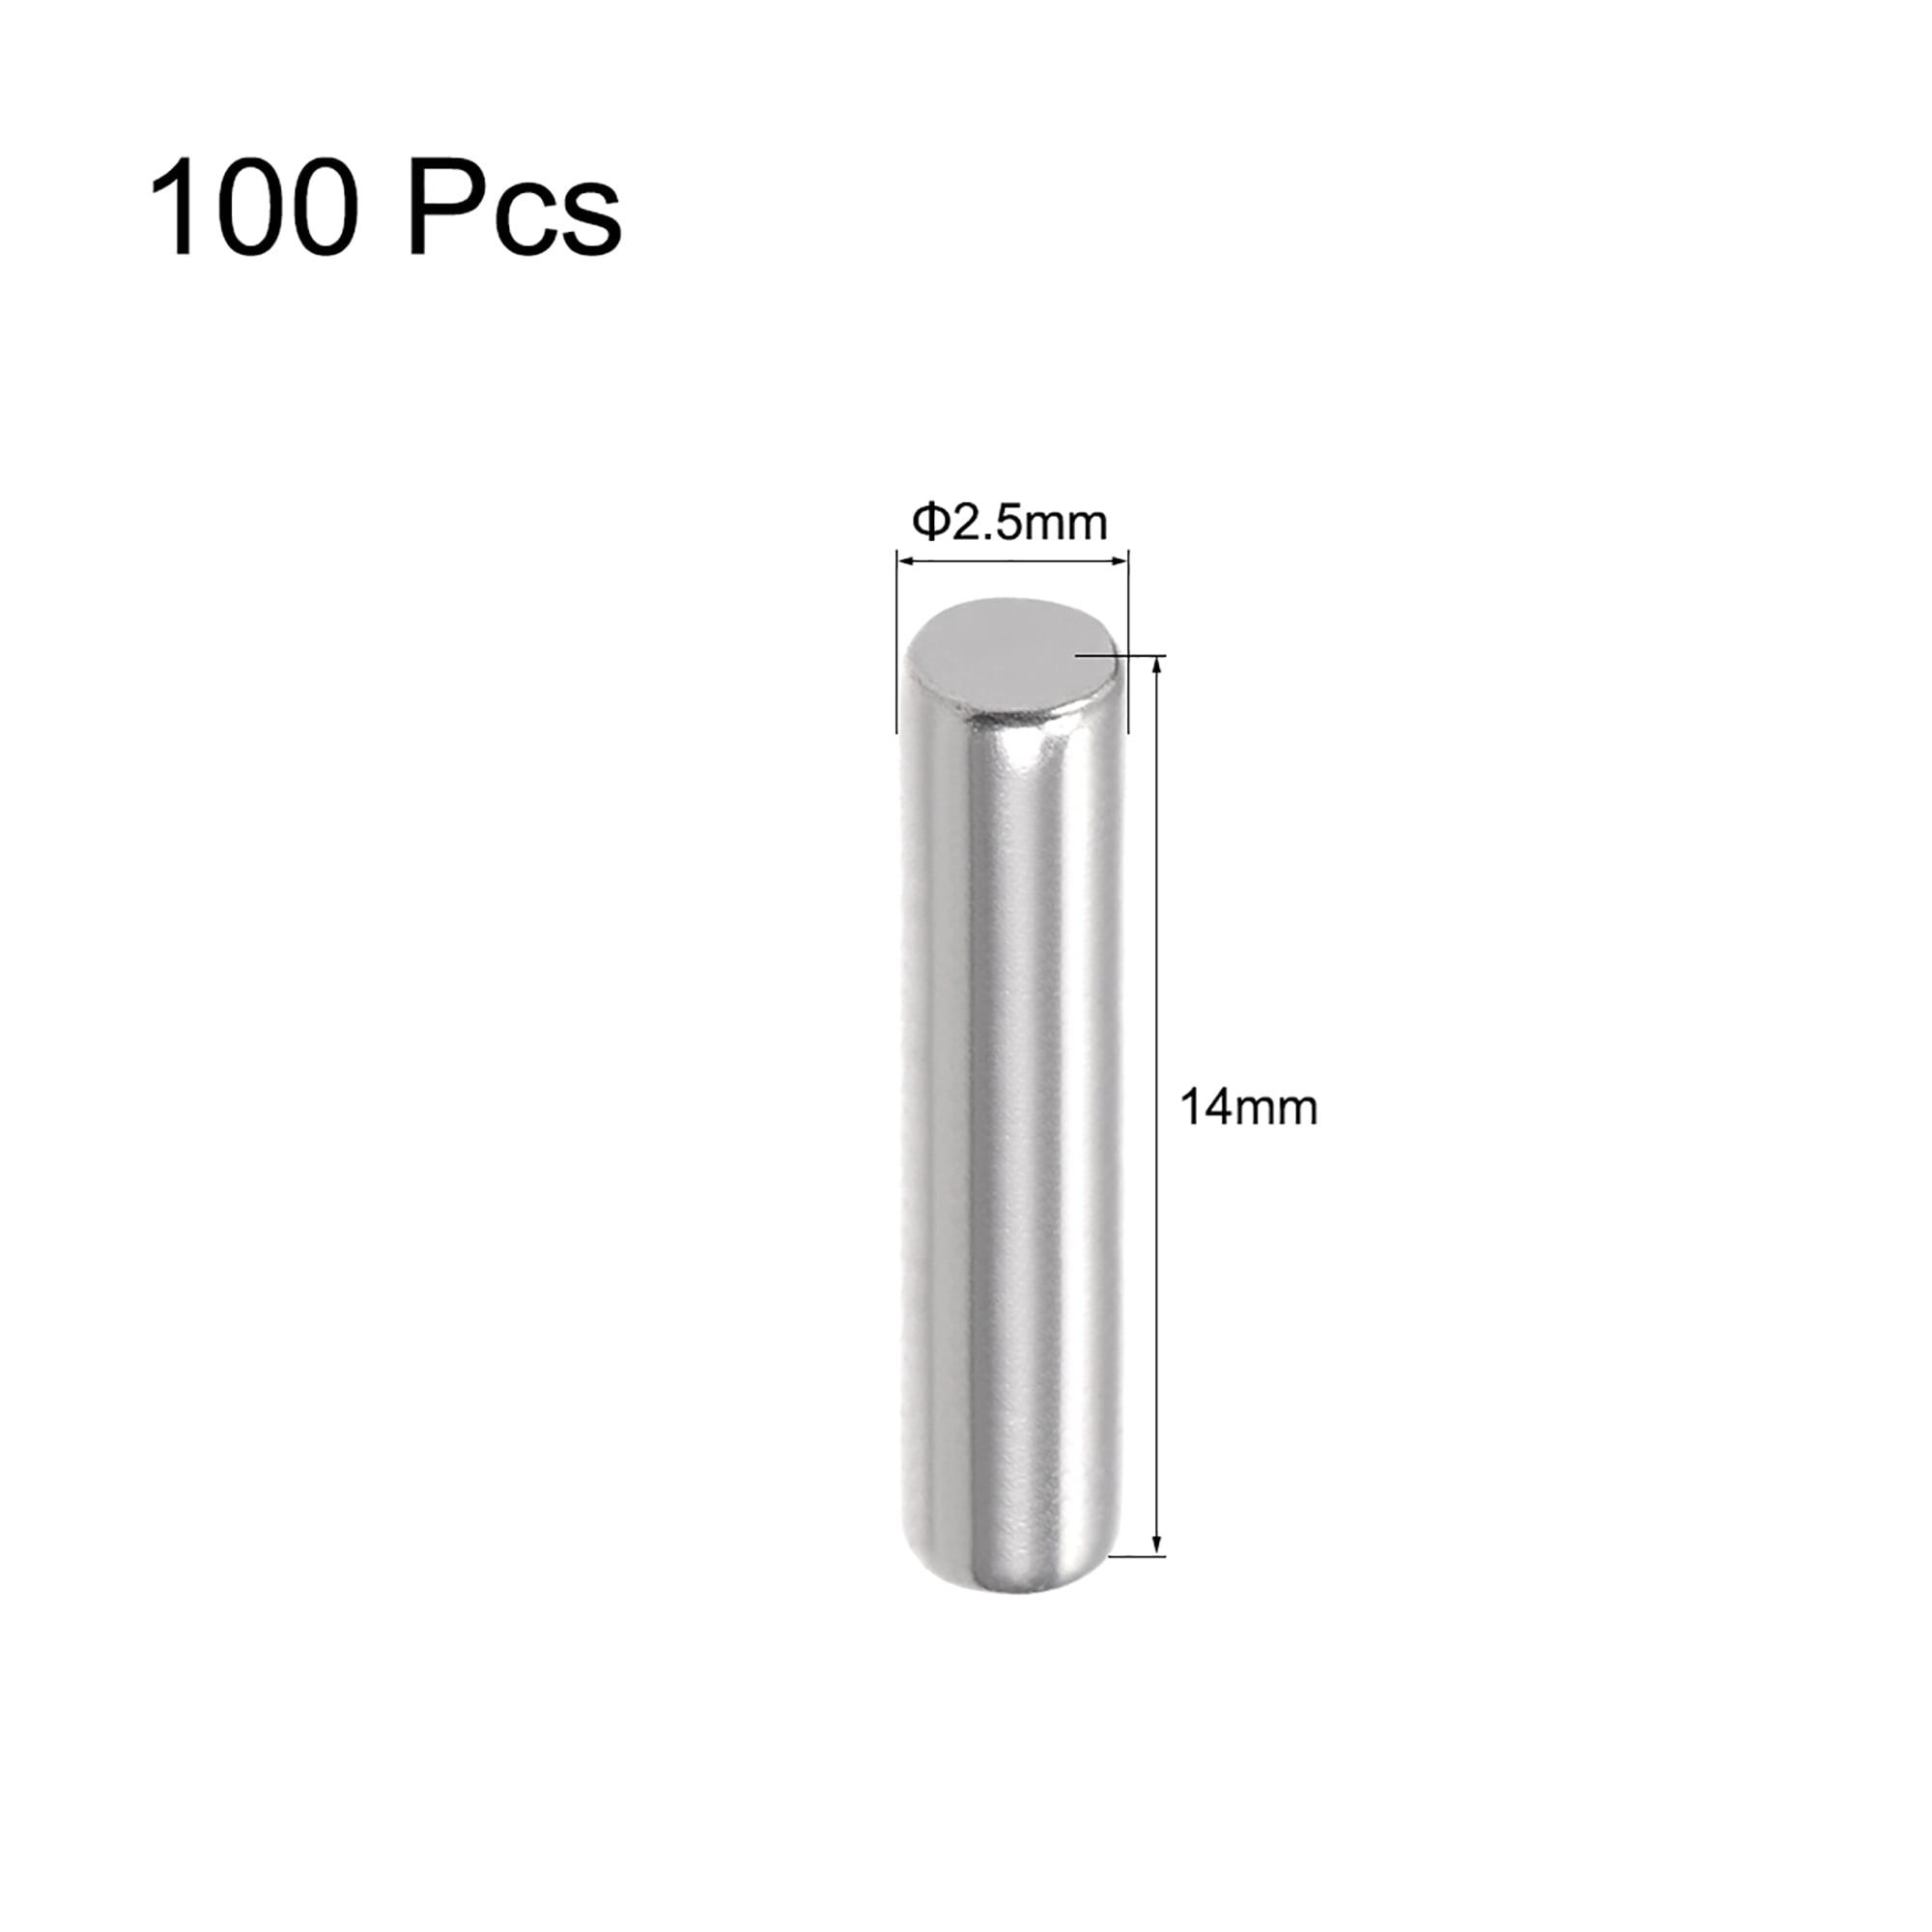 100Pcs 2.5mm x 14mm Dowel Pin 304 Stainless Steel Shelf Support Pin Fasten Elements Silver Tone - image 1 de 2